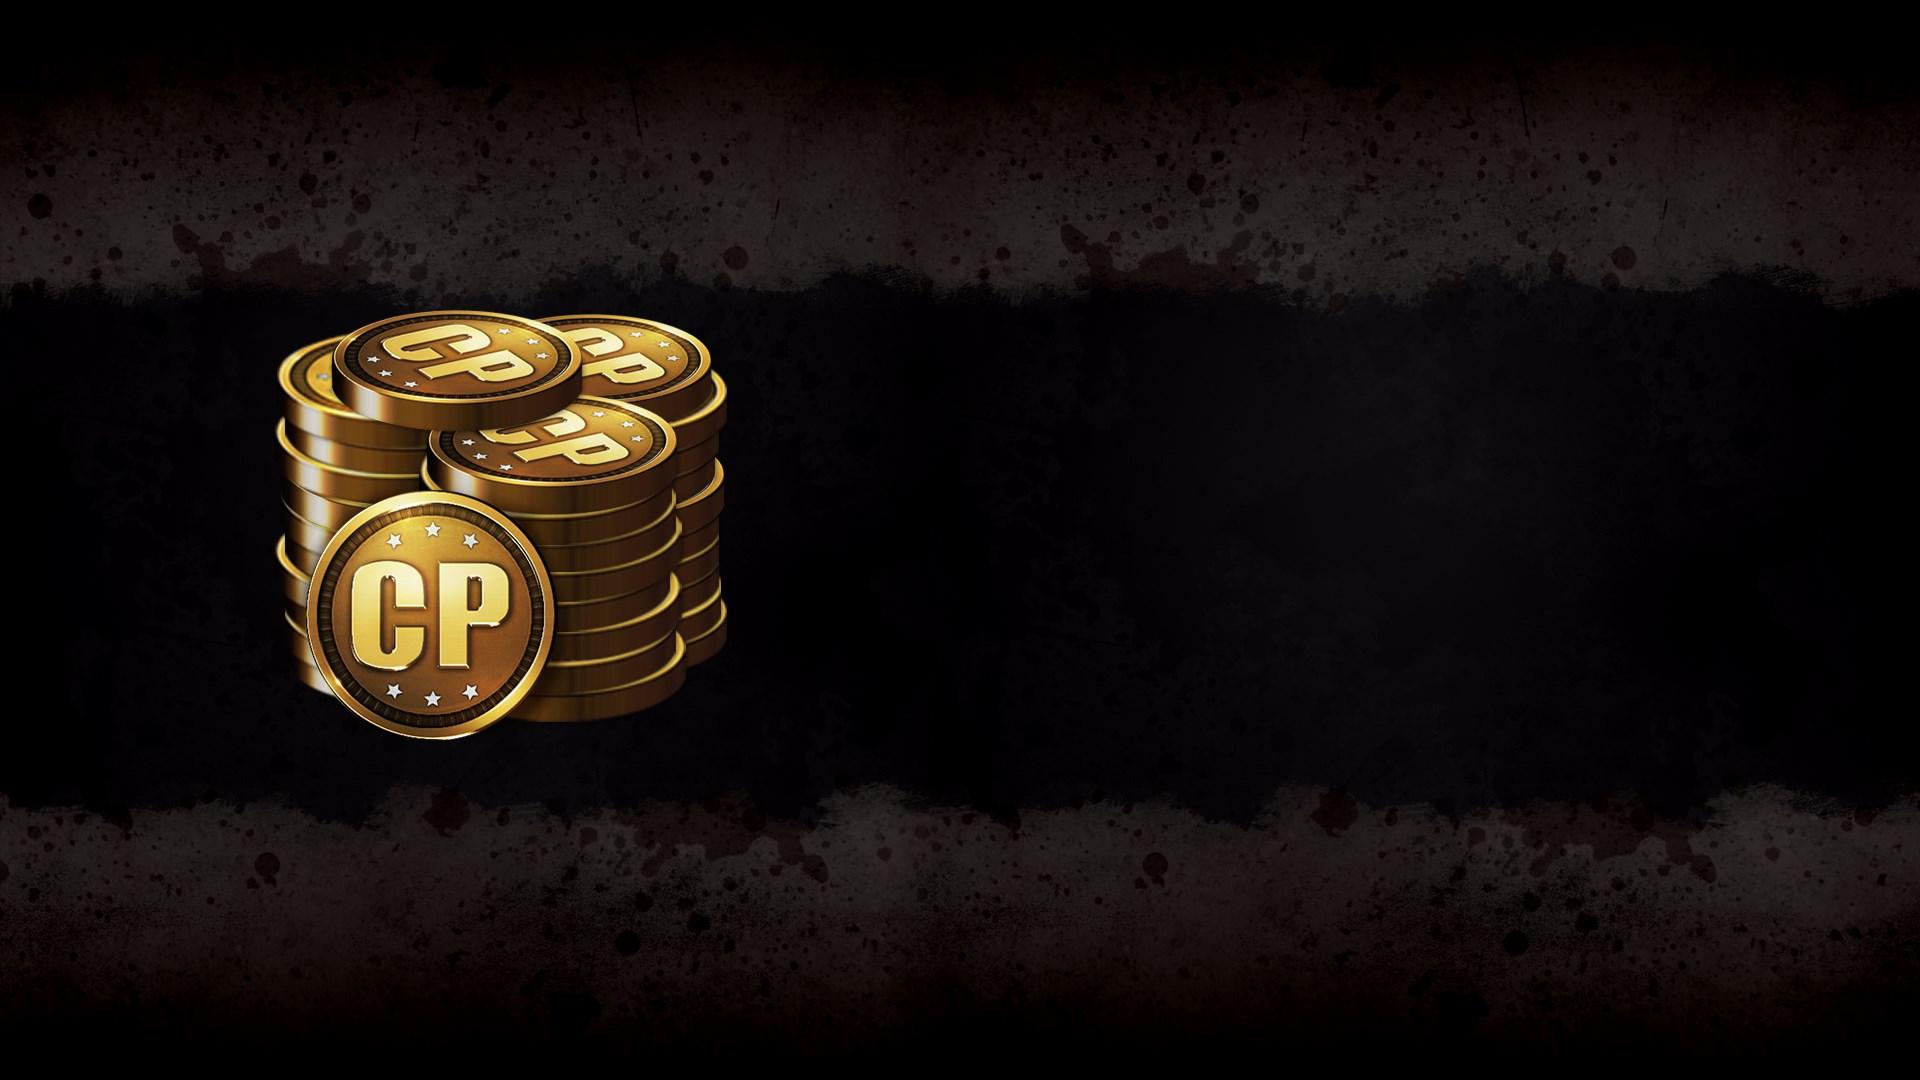 9,500 Call of Duty®: Infinite Warfare Points